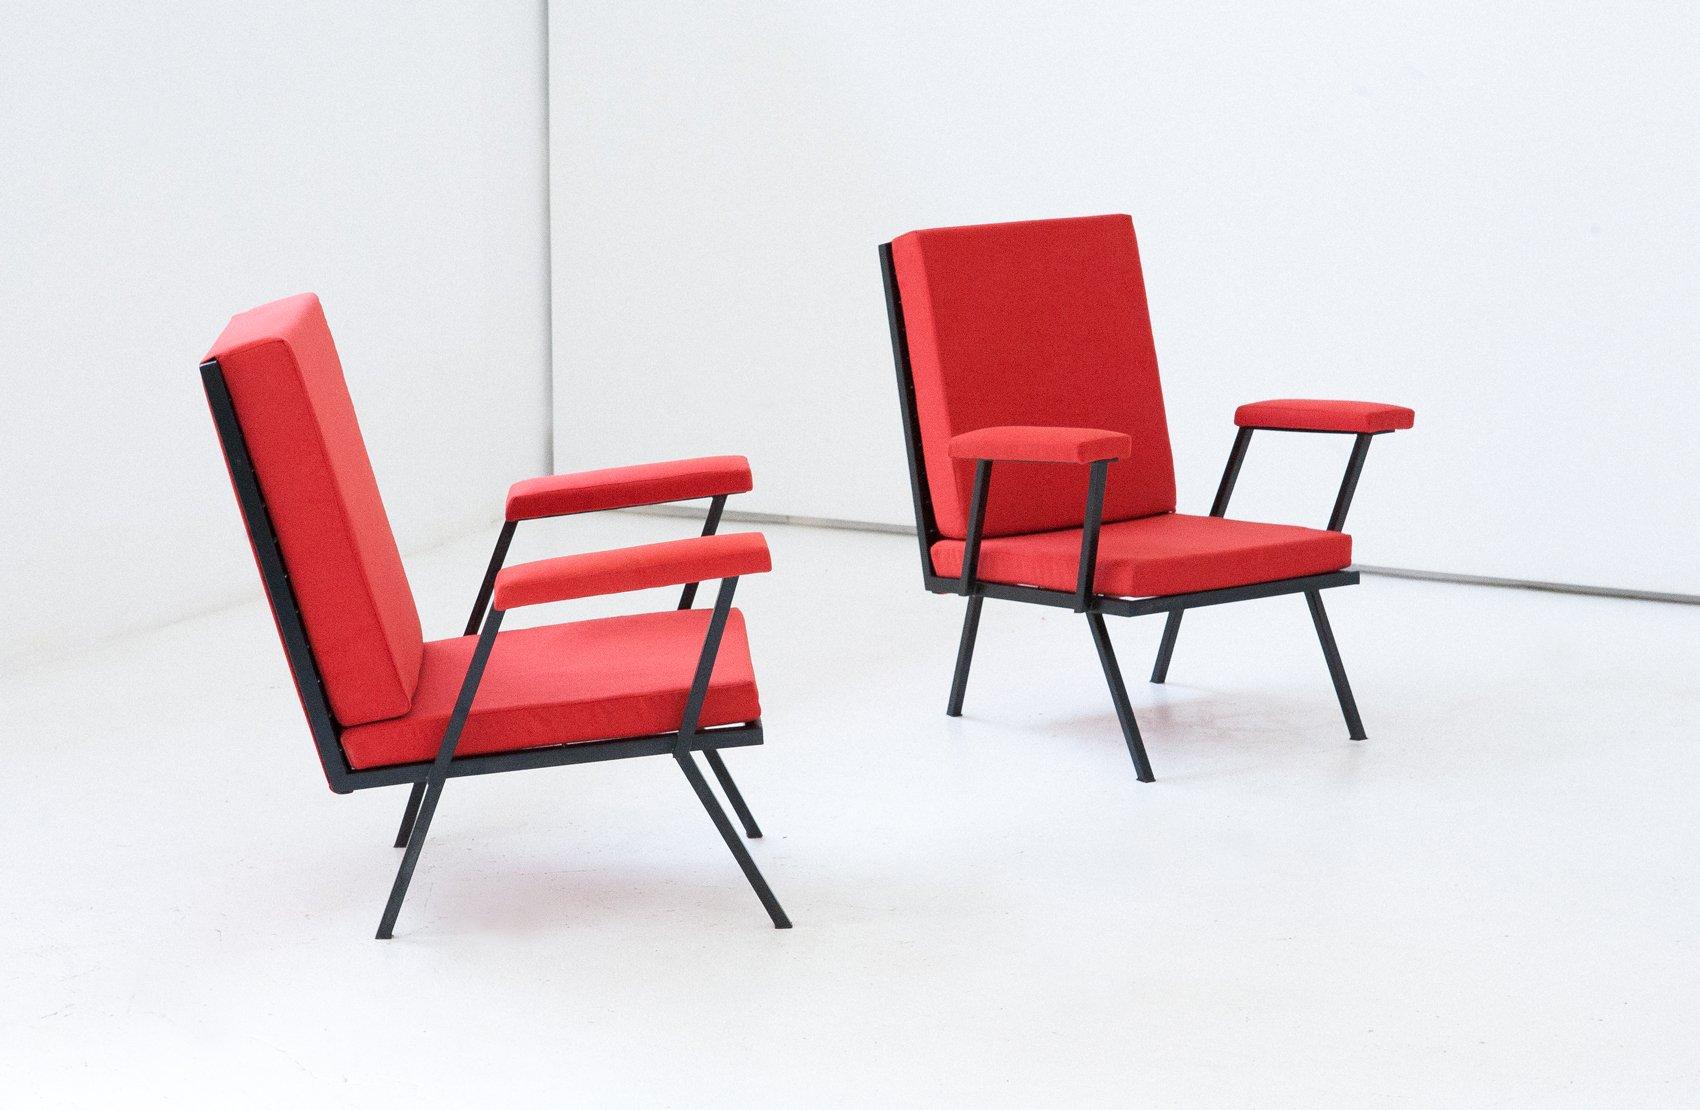 Rote italienische sessel aus eisen 1950er 2er set bei for Sessel italienisches design